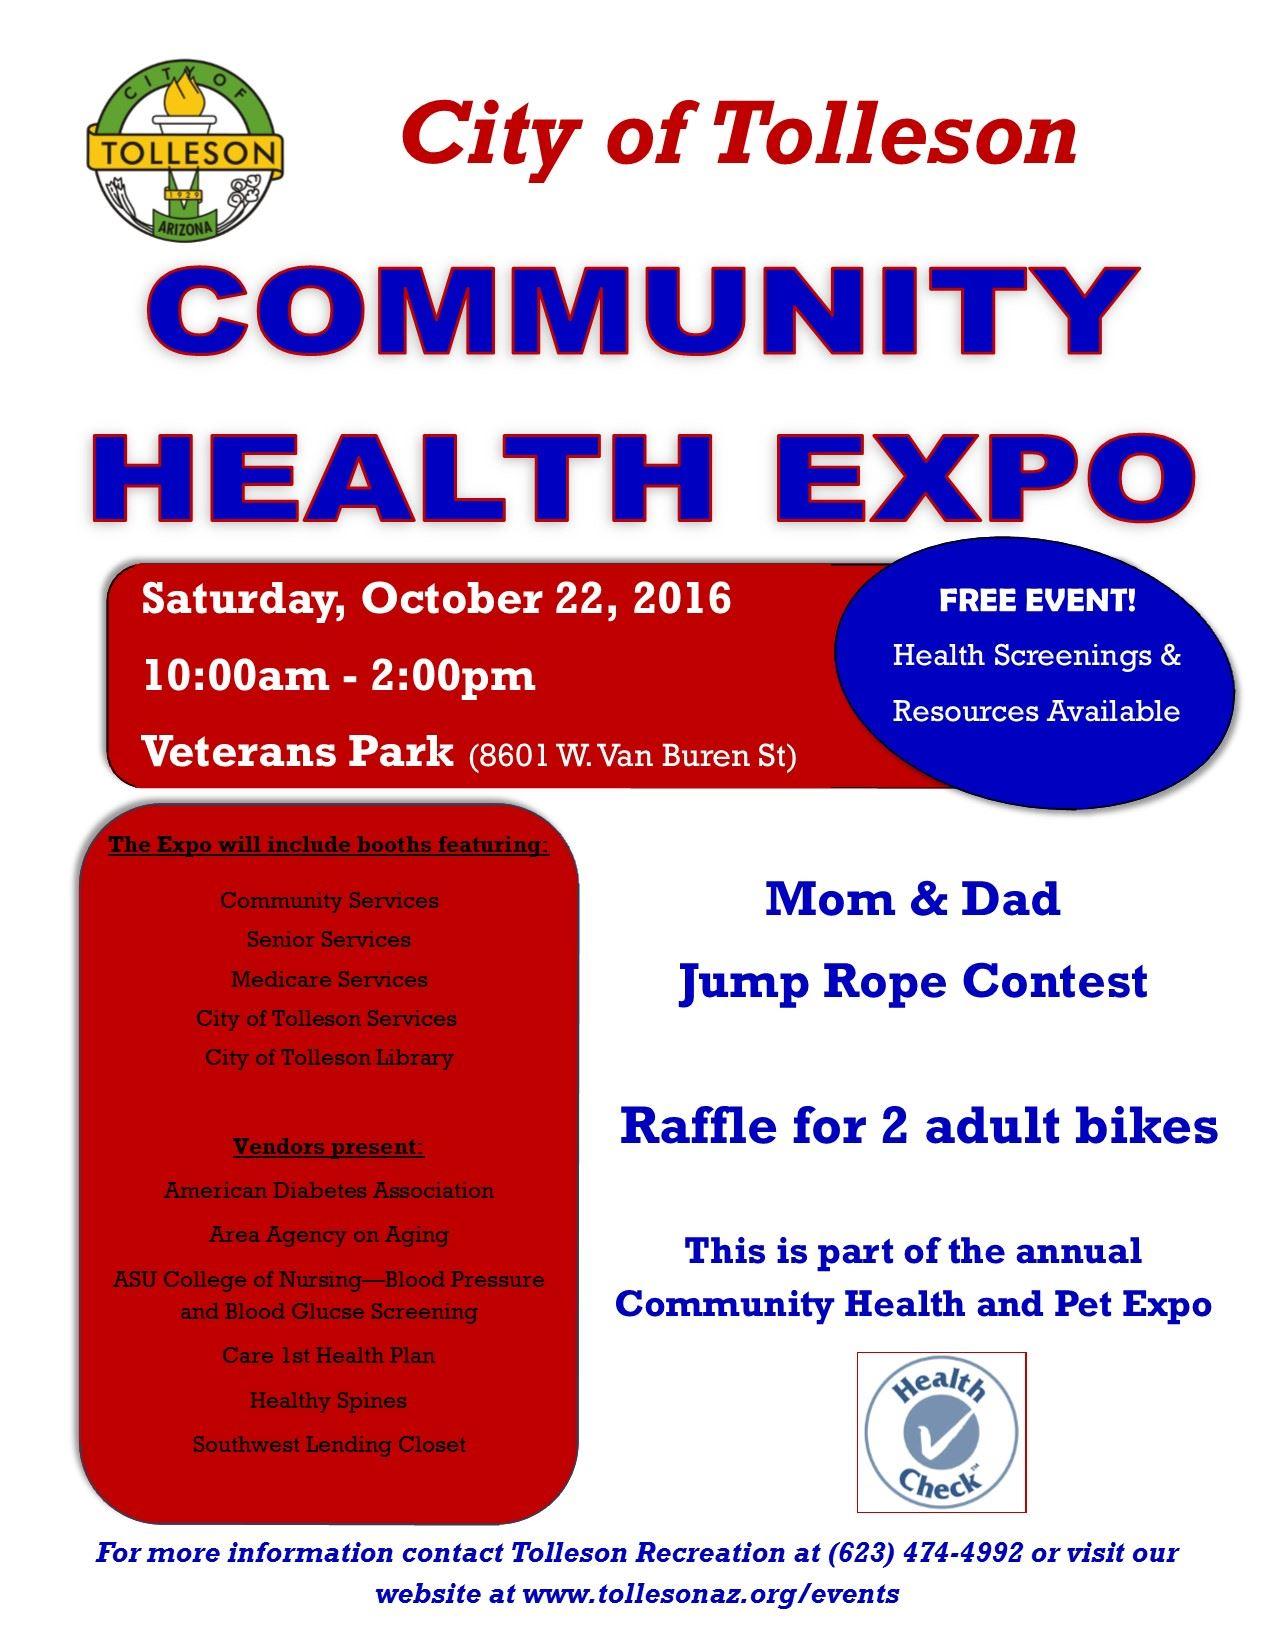 Health Expo Flyer 2016